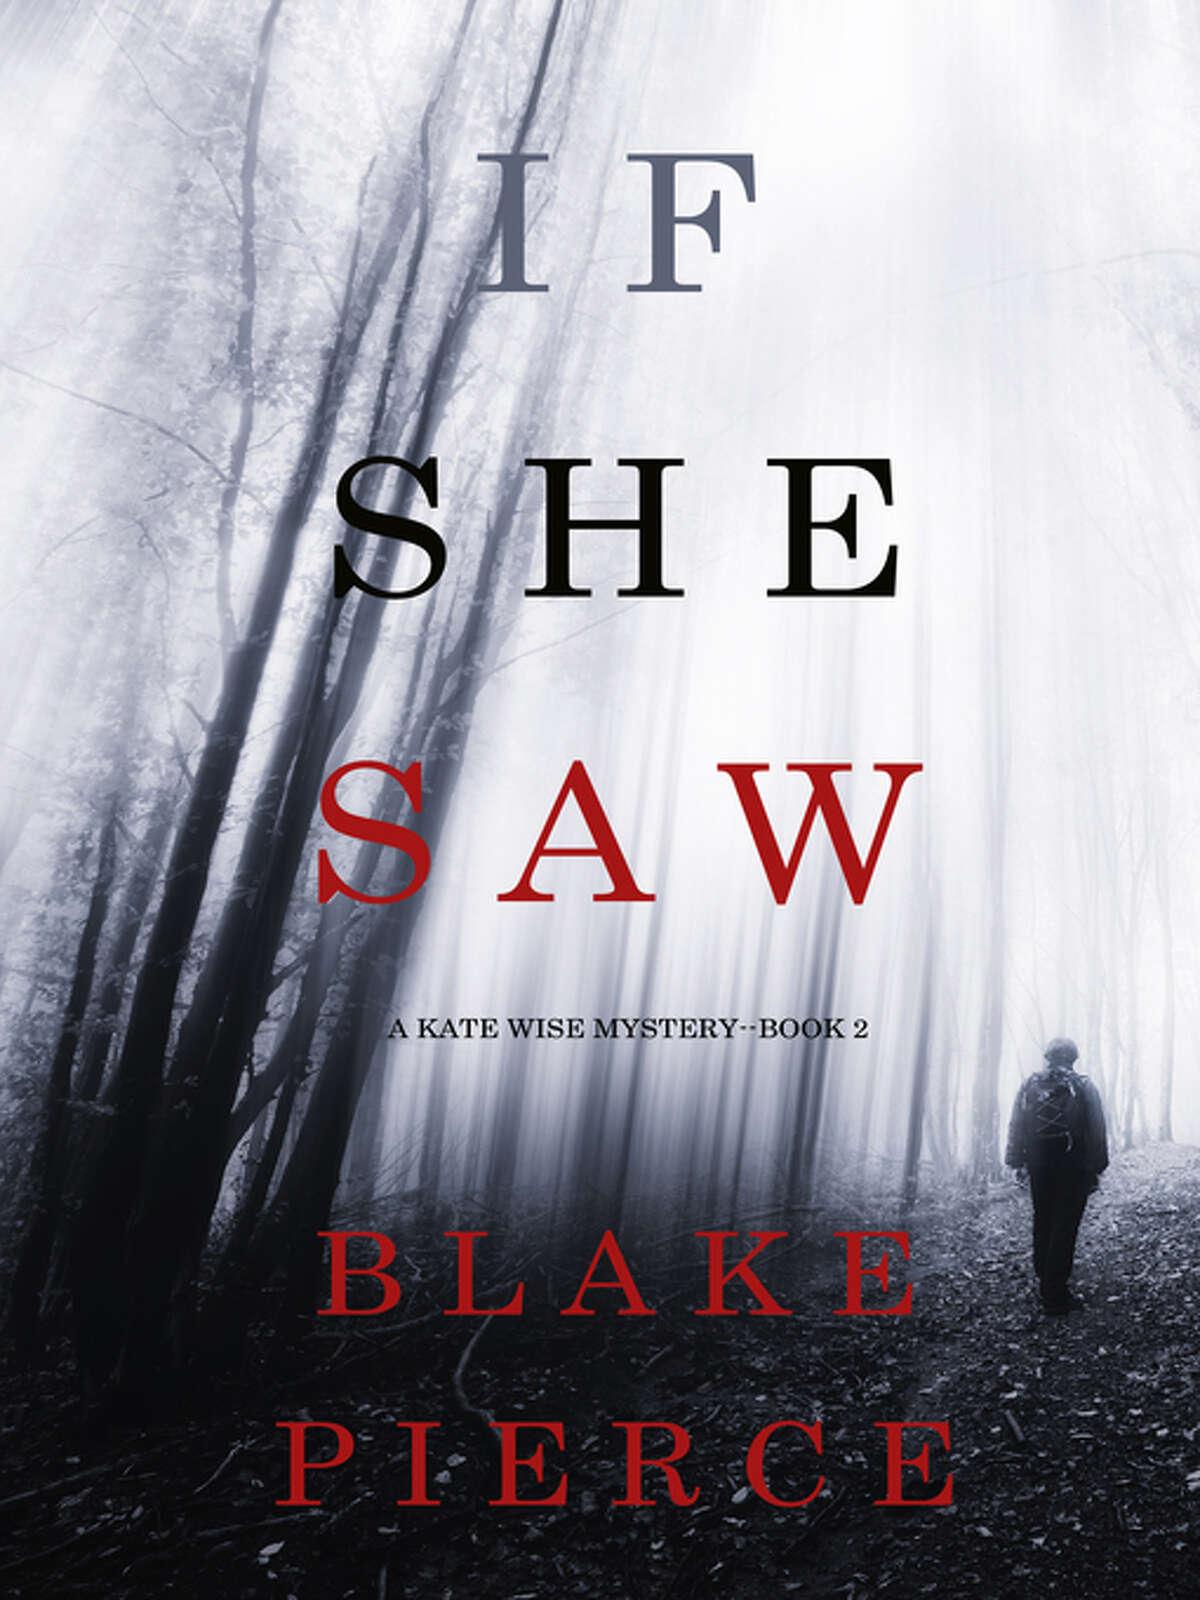 8. If She Saw: A Kate Wise Mystery, byBlake Pierce Checkout total: 61